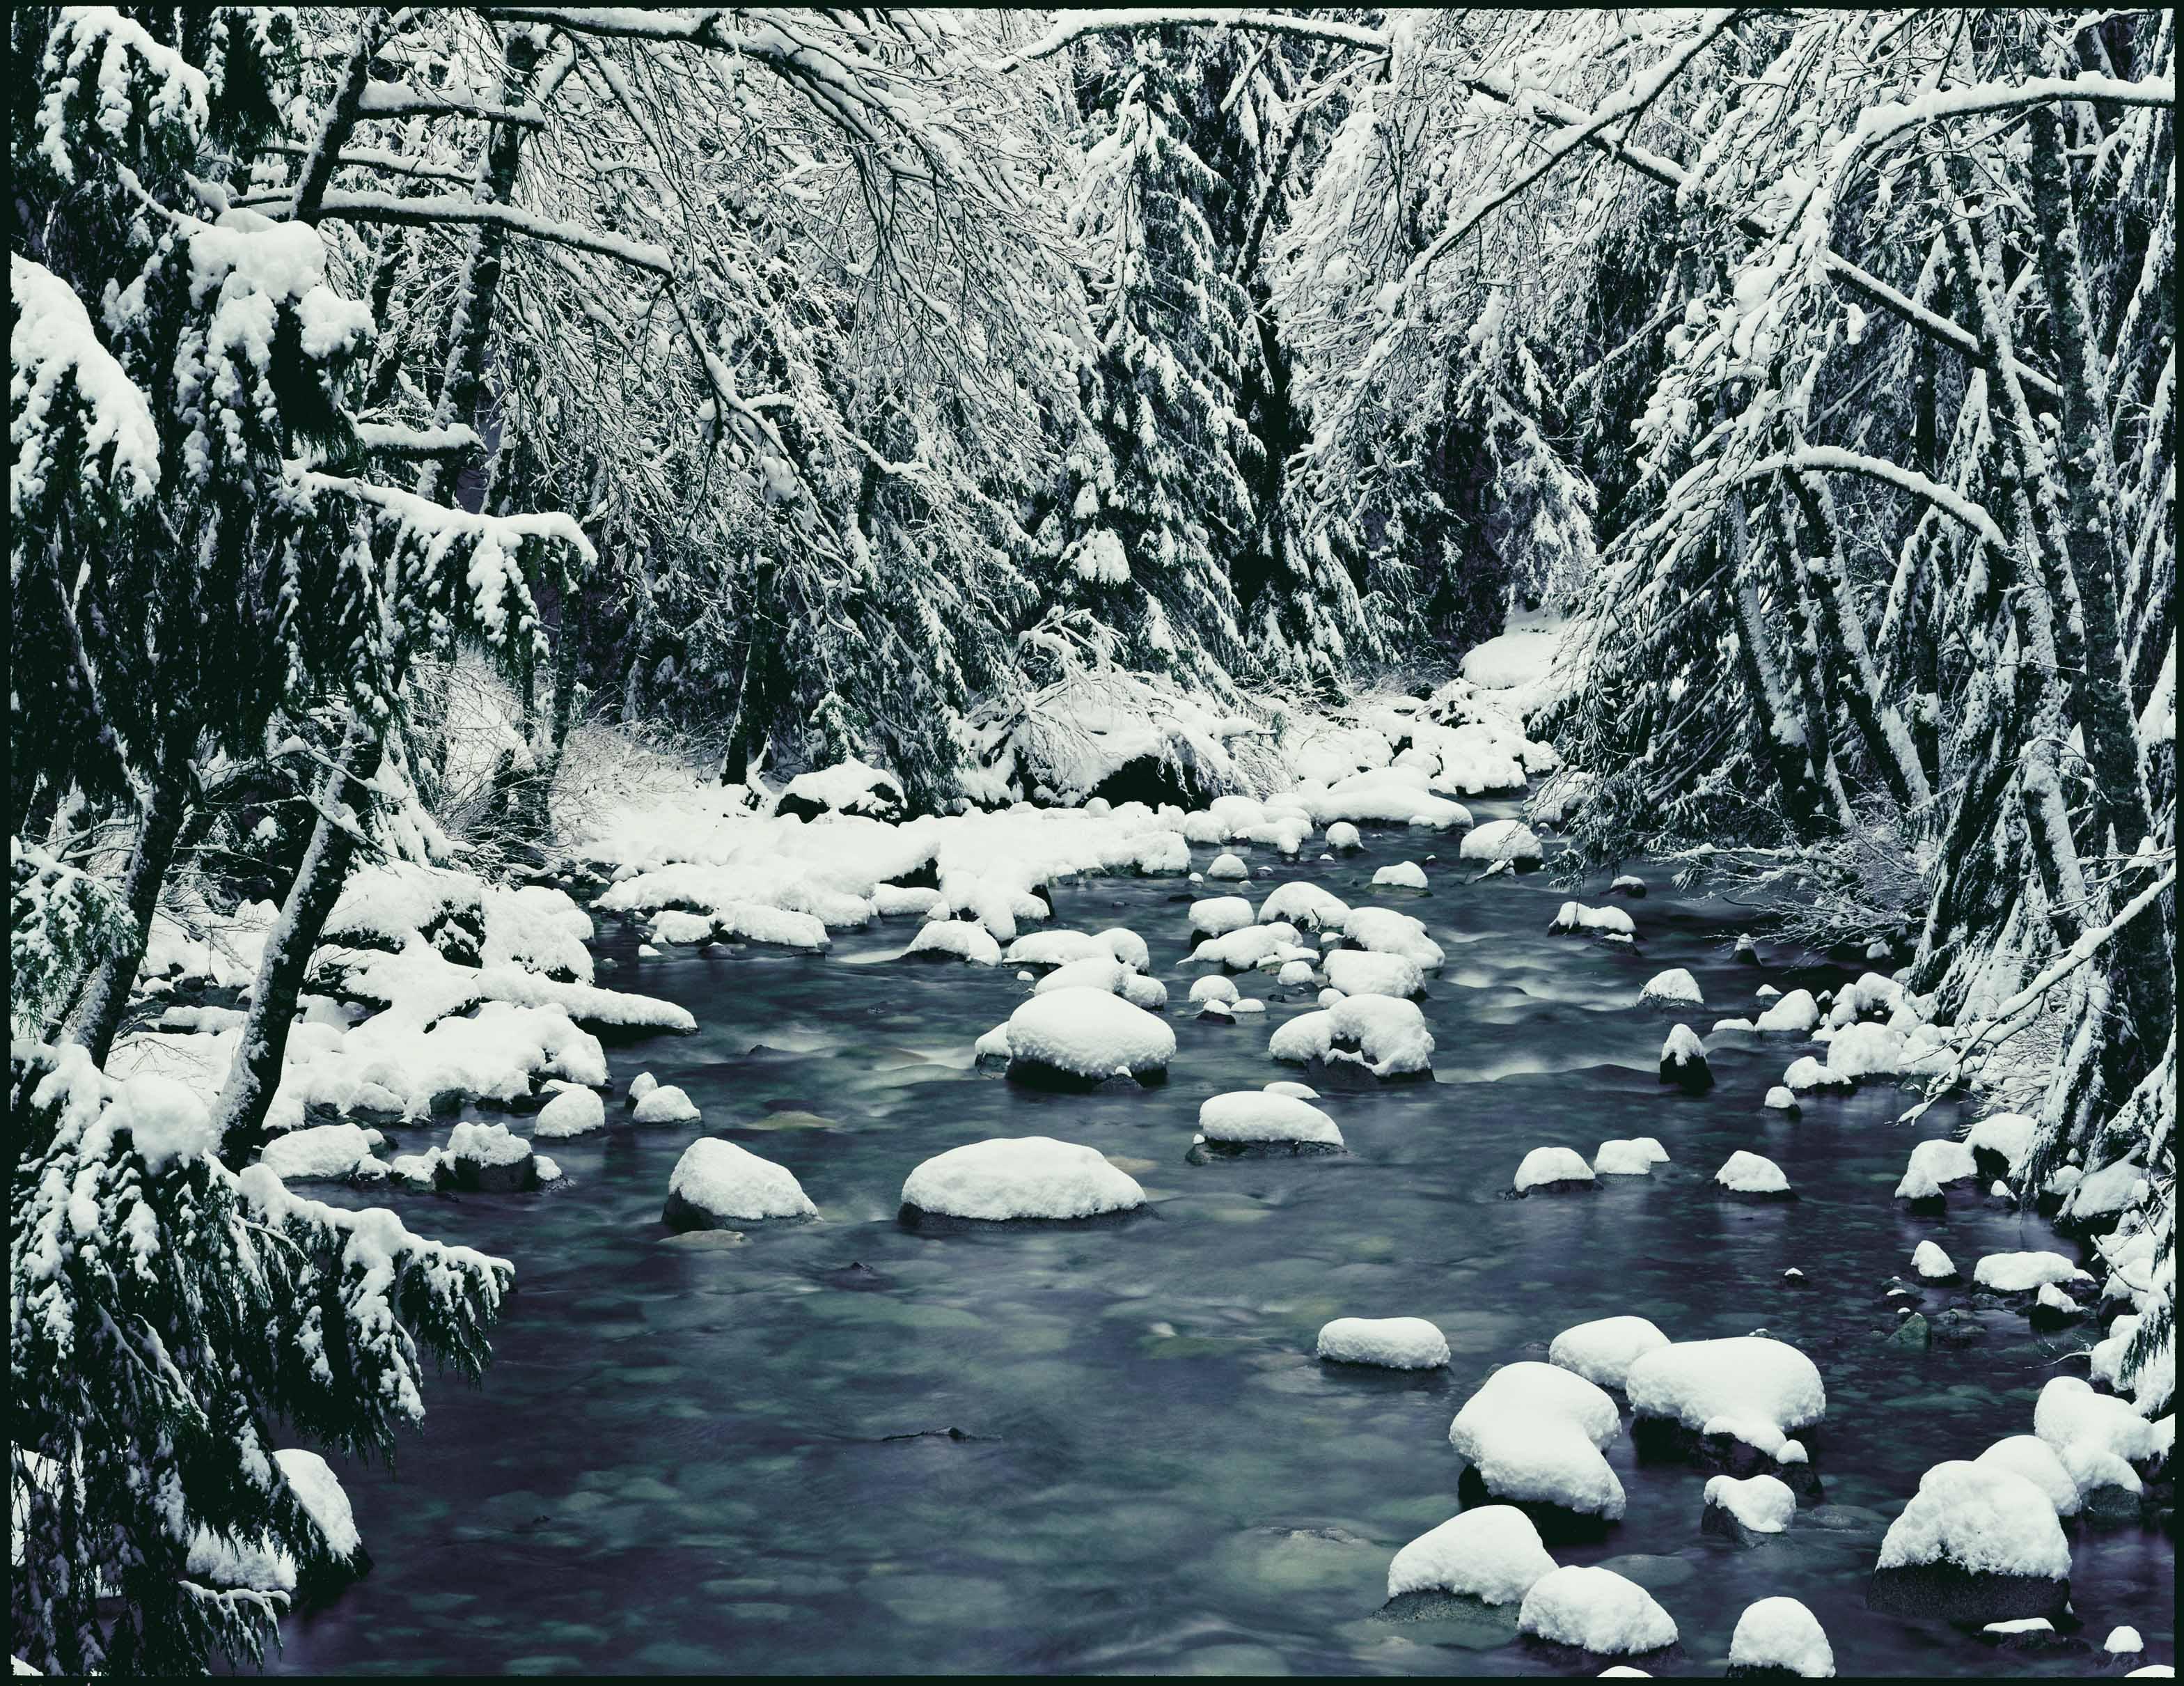 Denny Creek, WA